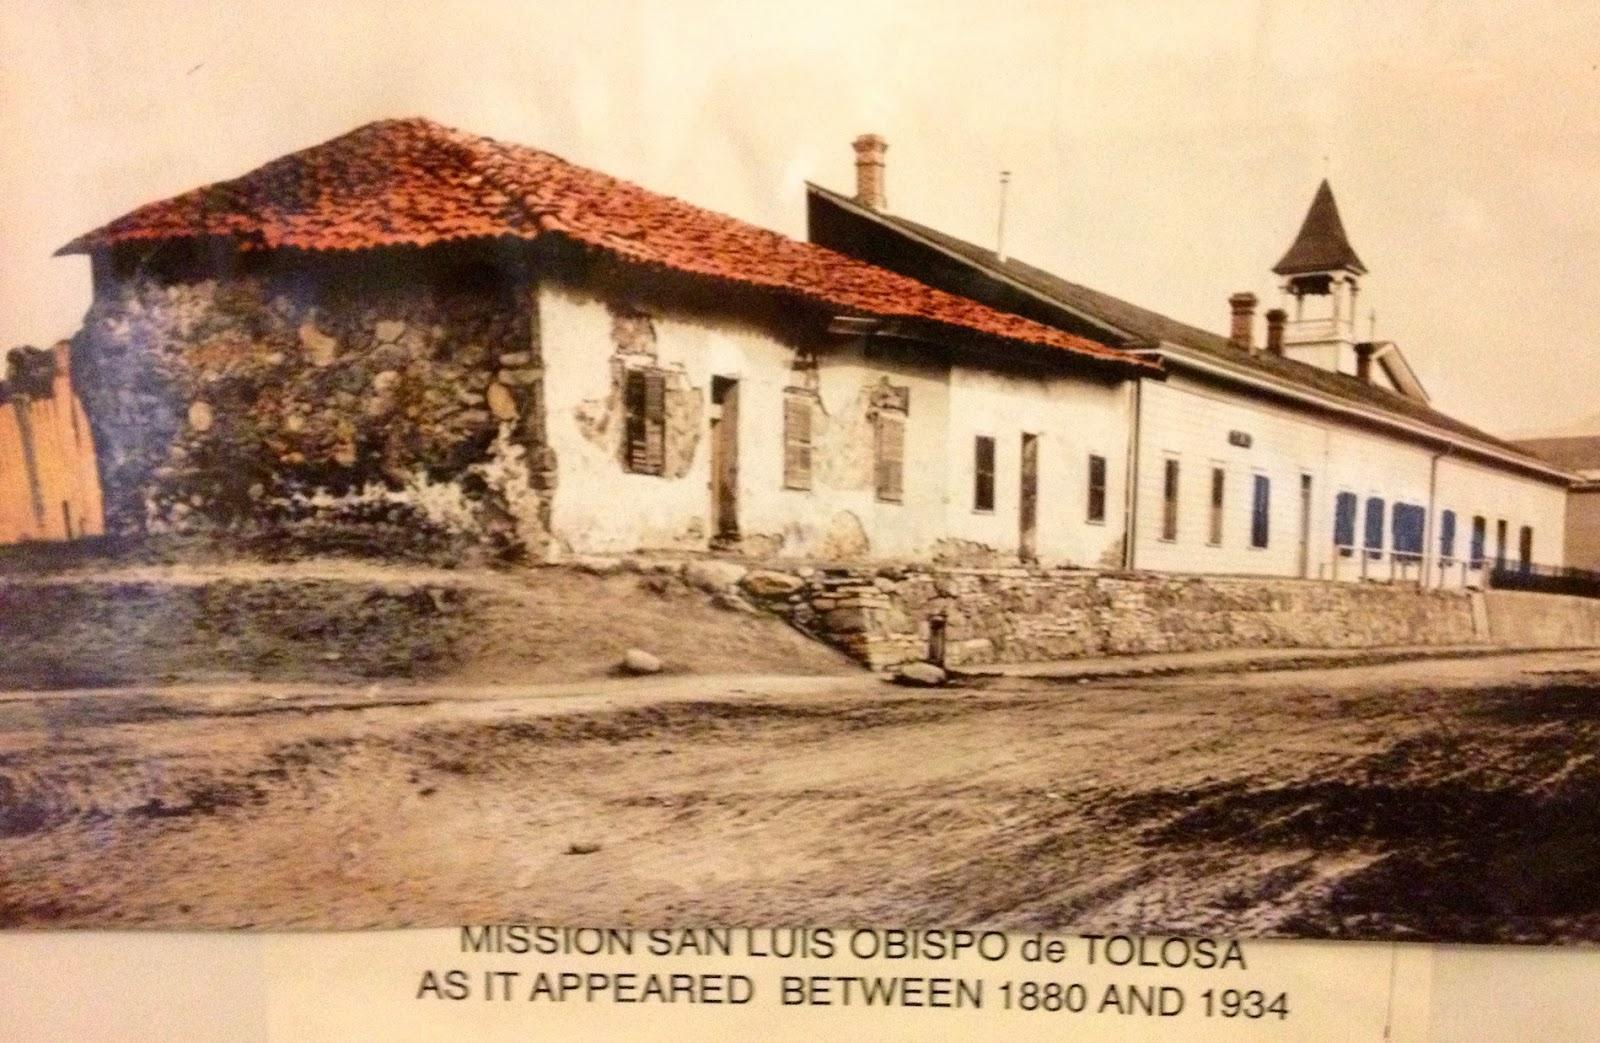 San luis obispo dating sites